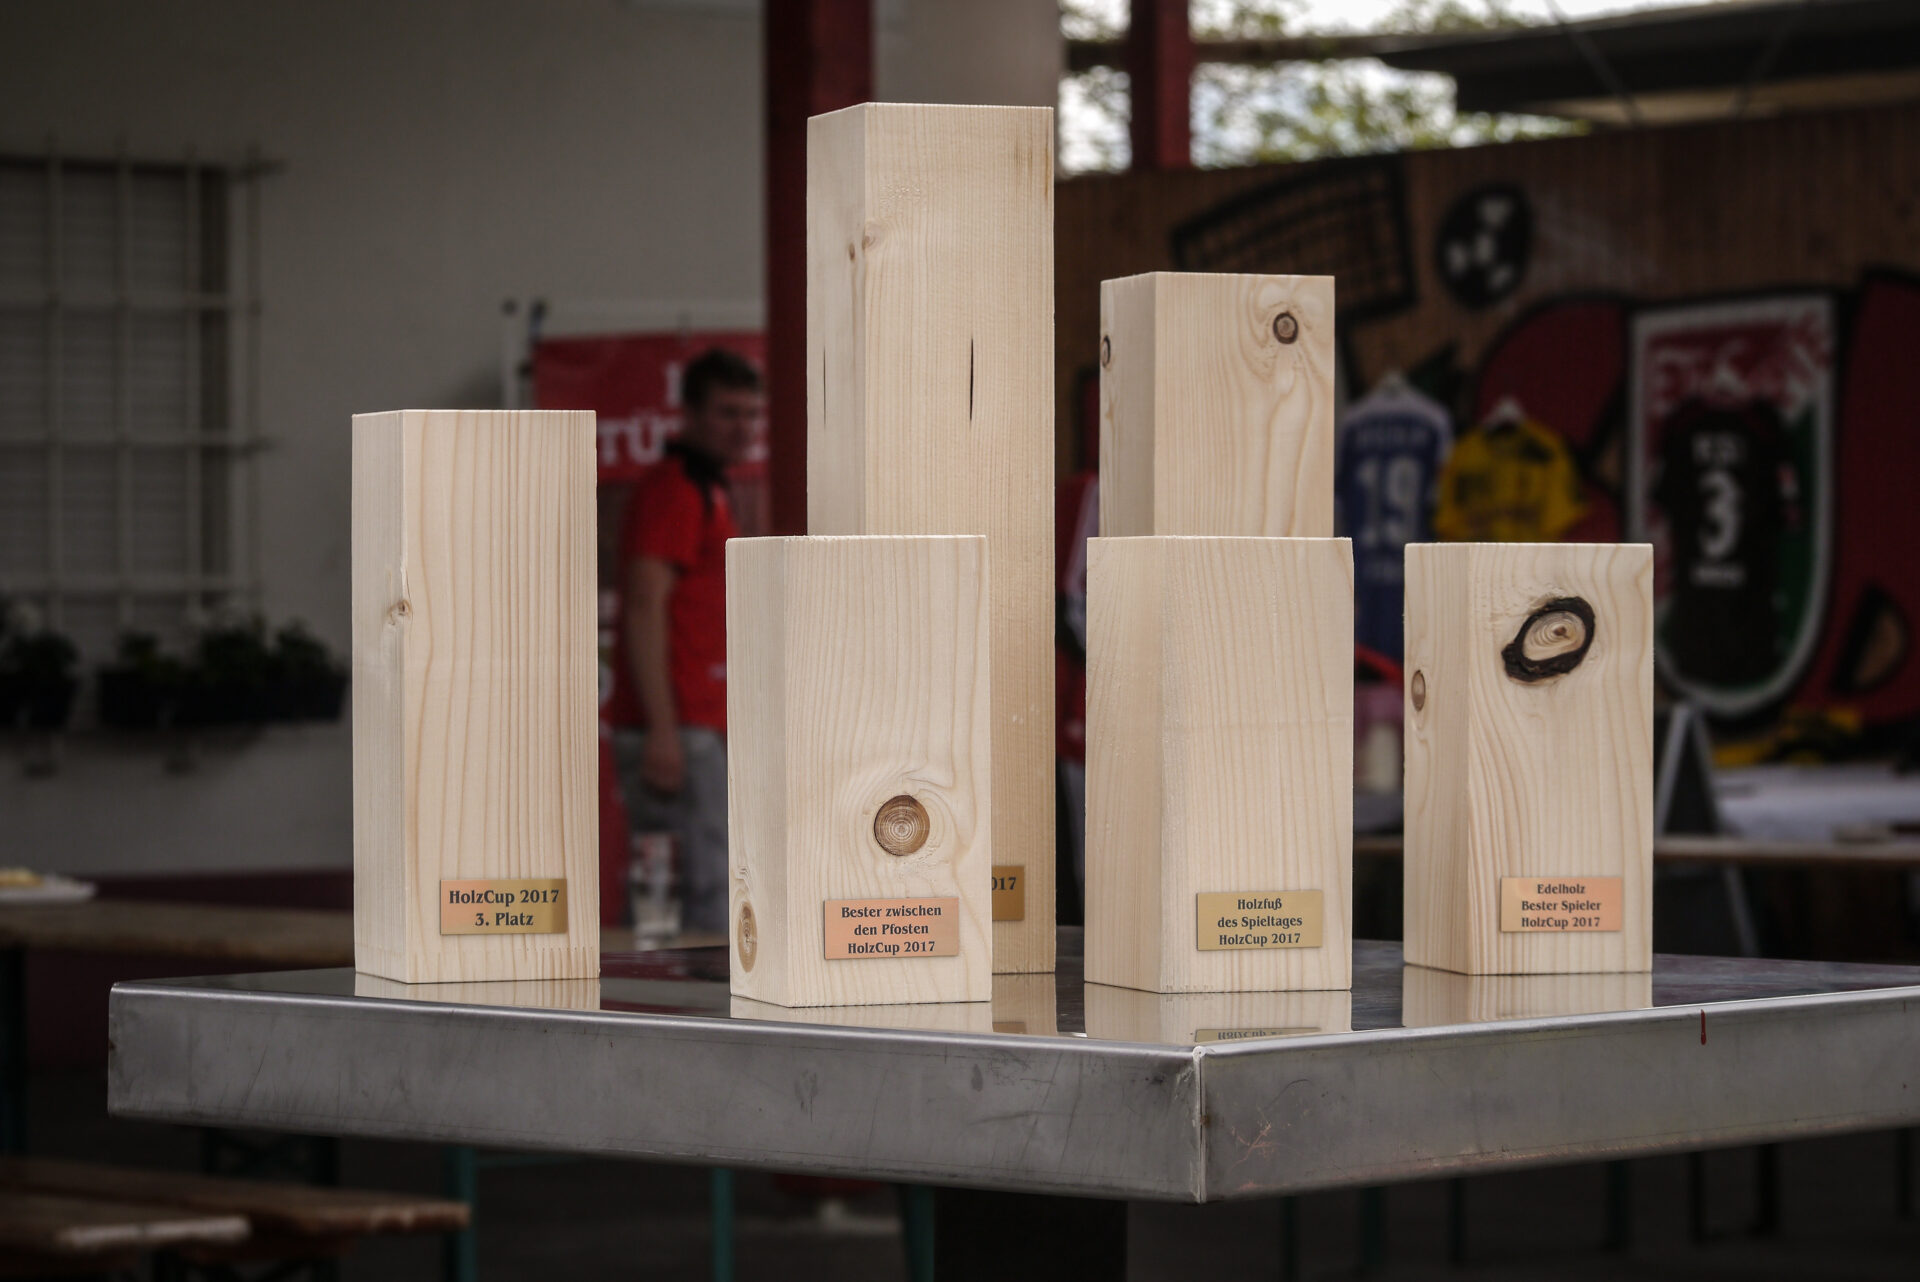 1. Brennholz-Cup: Die inoffizielle Stadtmeisterschaft der 2. Mannschaften